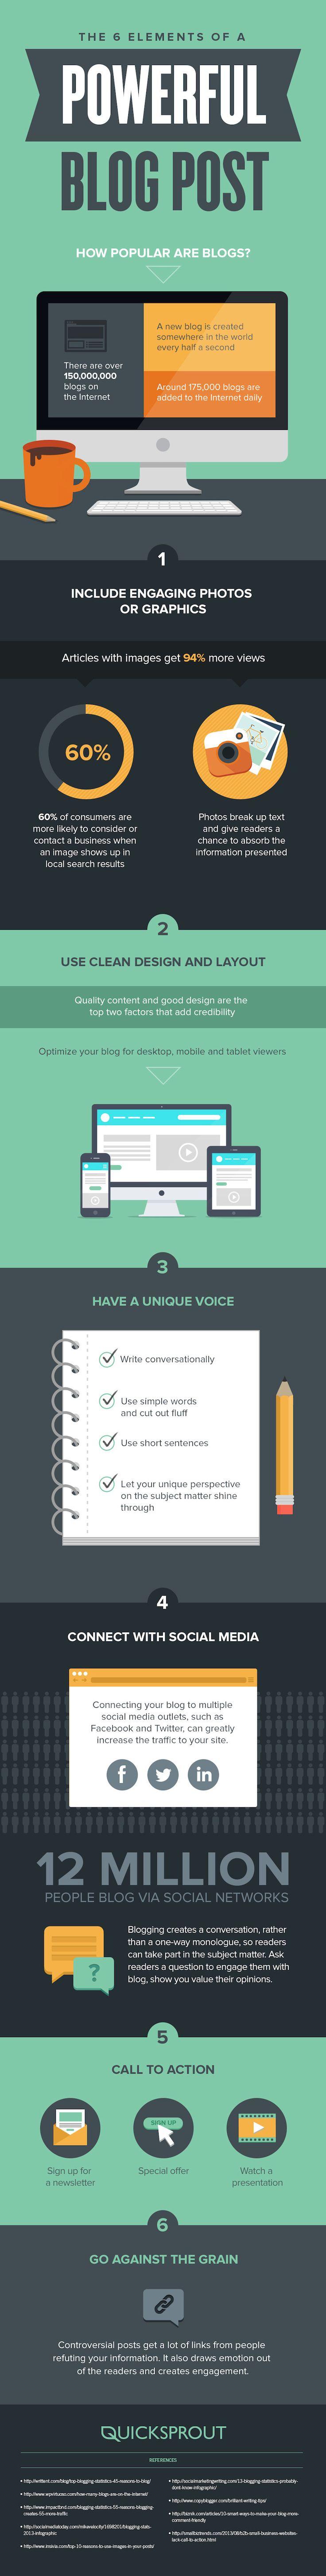 Los 6 elementos de un buen post para blog #infografia #infographic #socialmedia